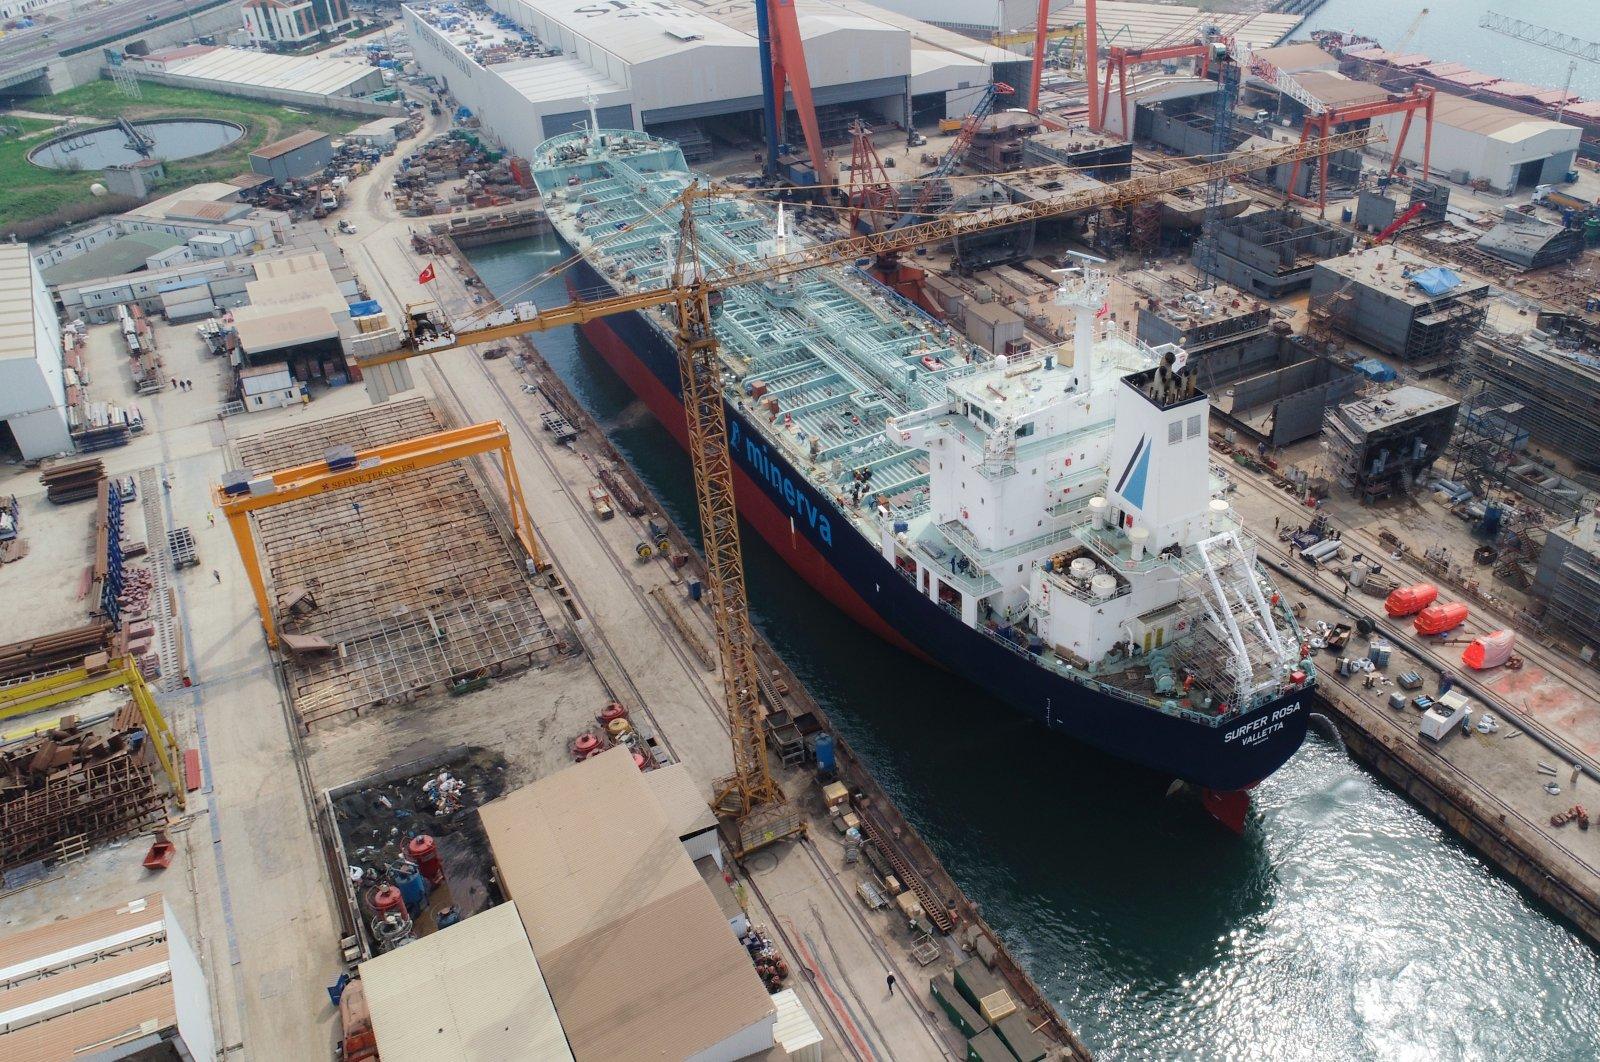 A ship is seen at the Sefine Shipyard in Yalova, northwestern Turkey in this undated photo. (Courtesy of Sefine Shipyard)